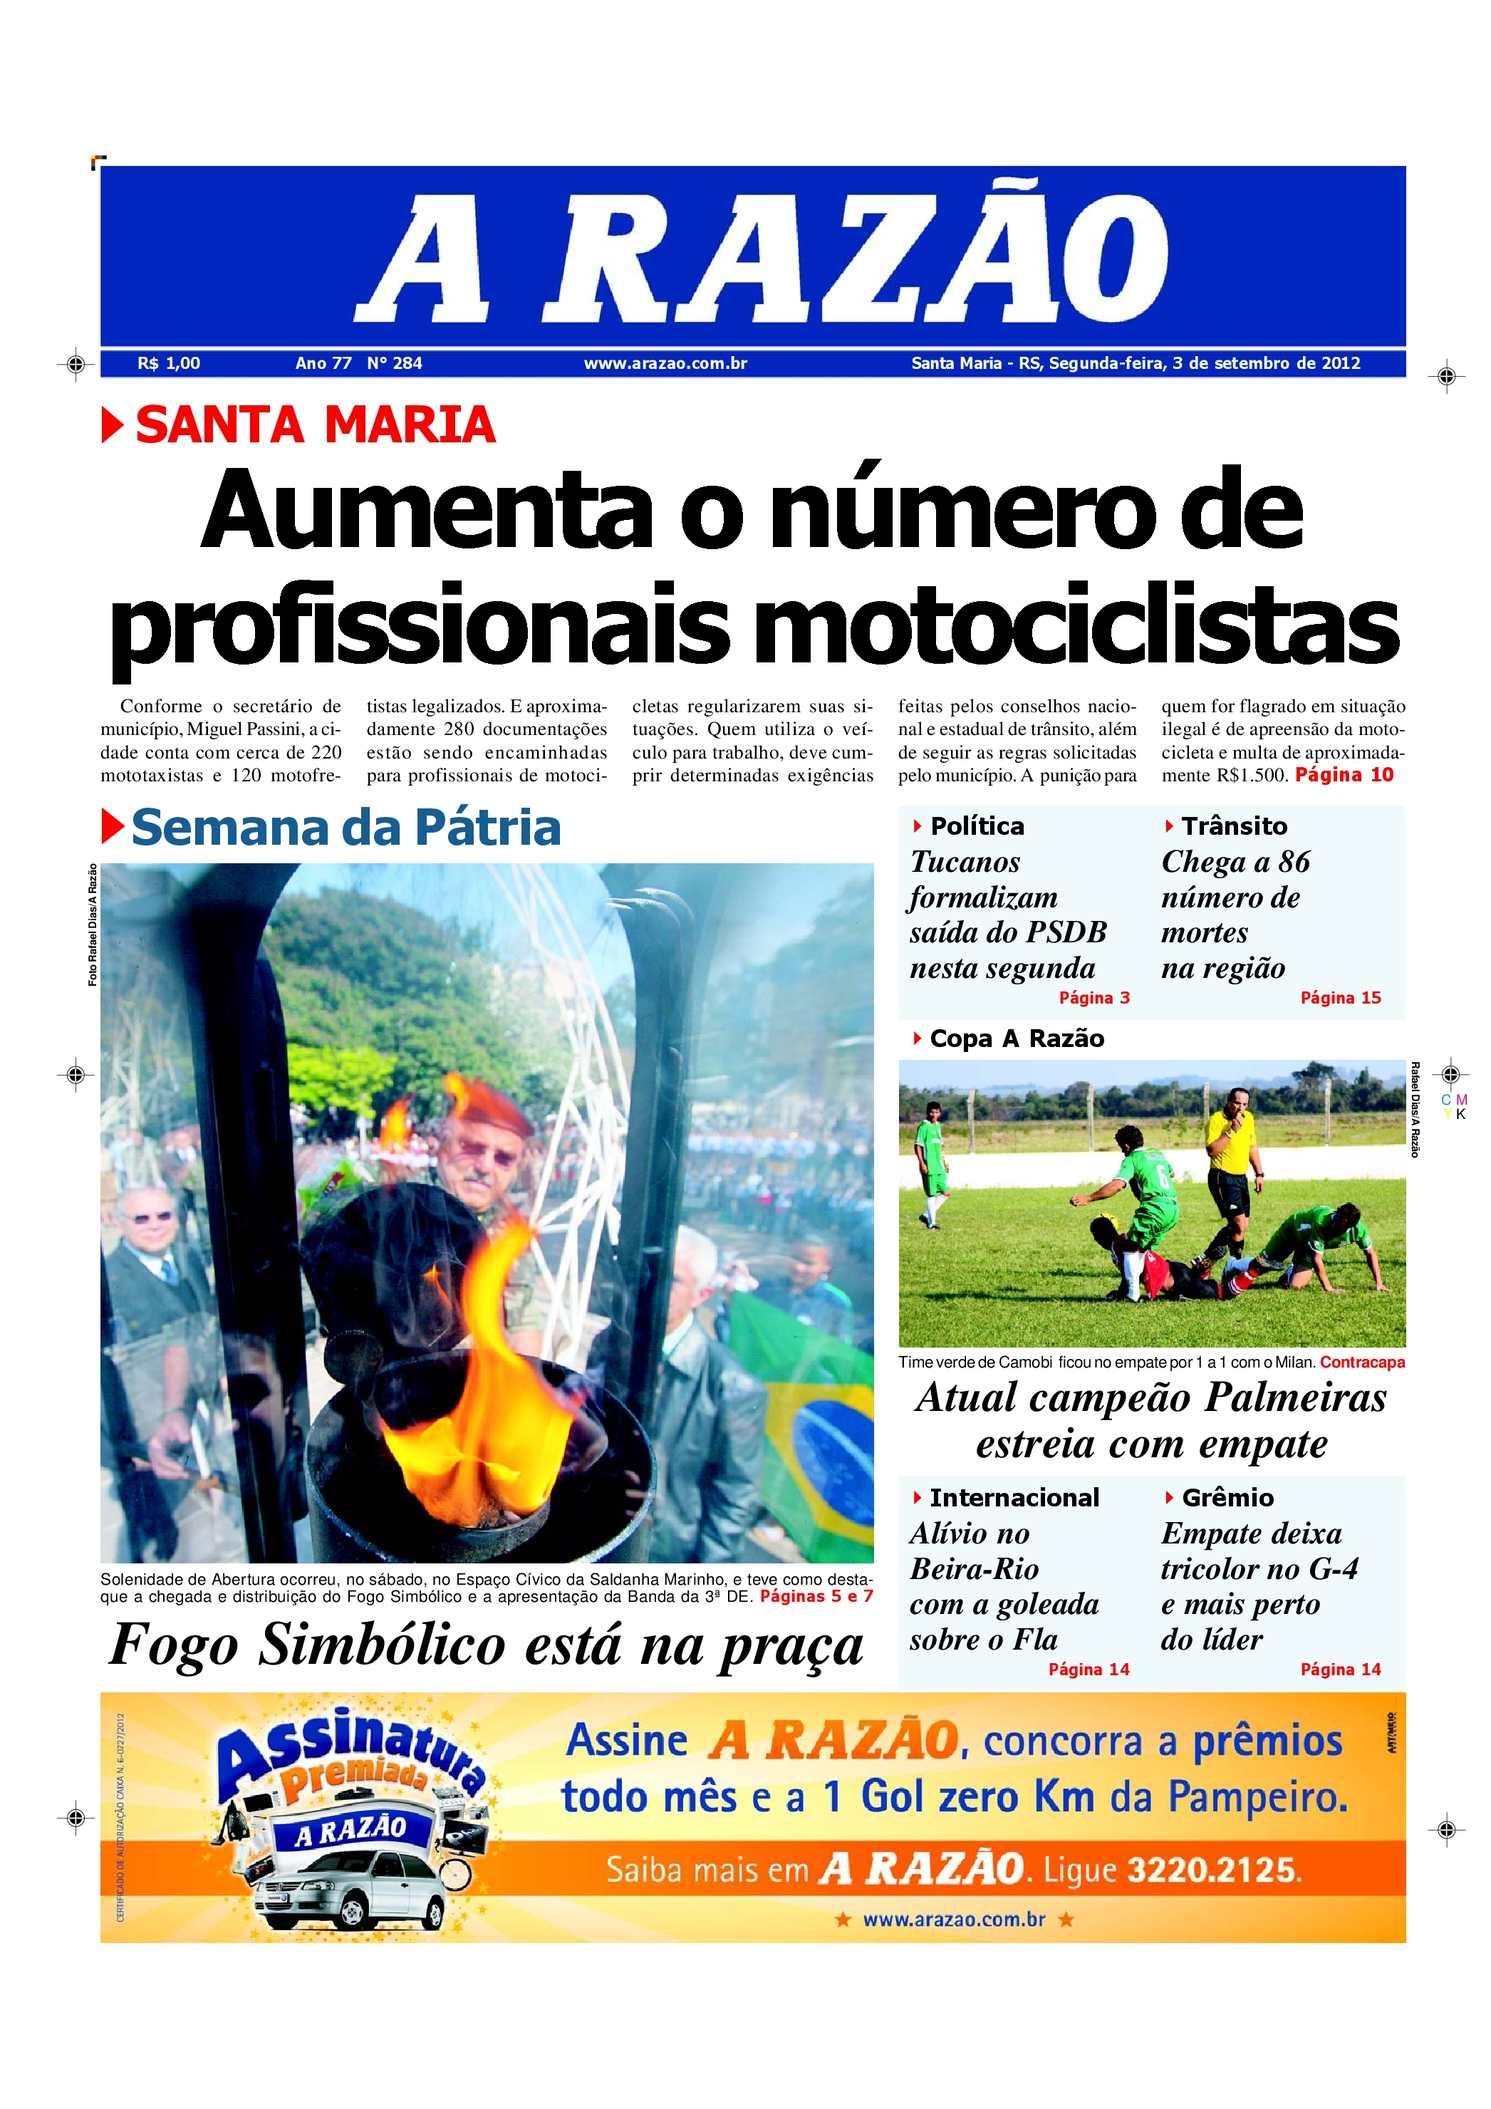 db1582a0e8 Calaméo - Jornal A Razão Santa Maria - 03092012